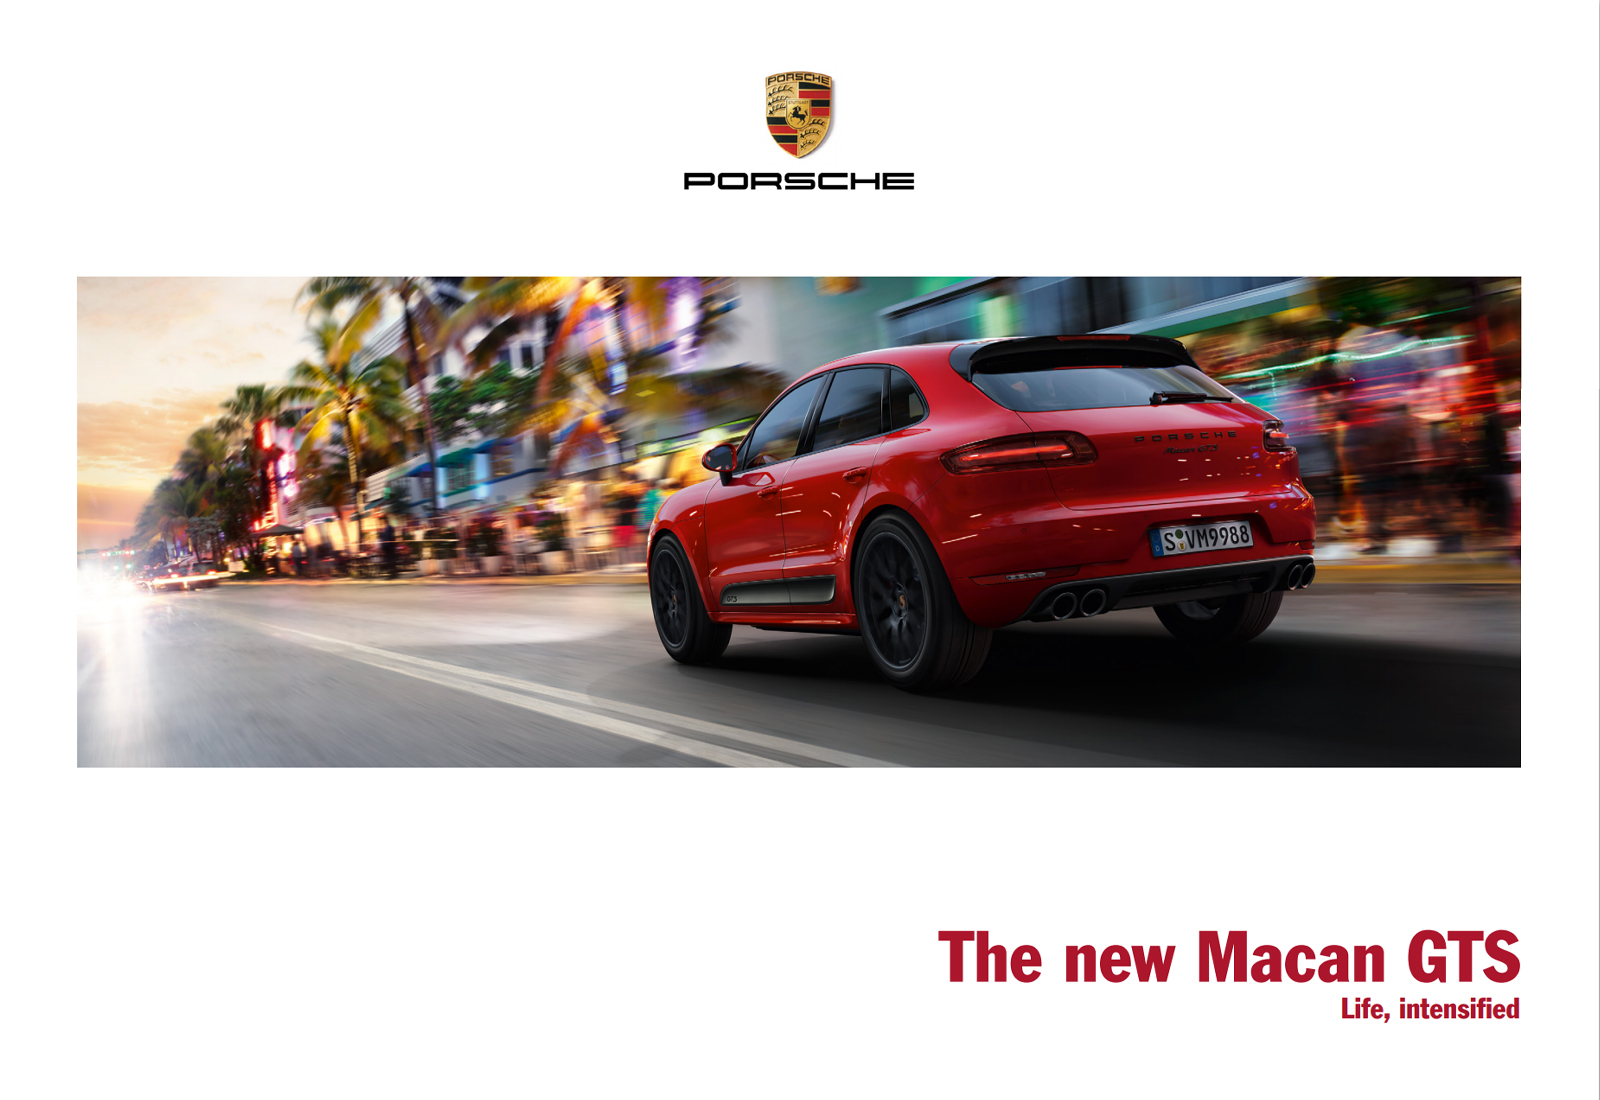 Porsche_Macan_2016_GTS_WW_brochure.jpg